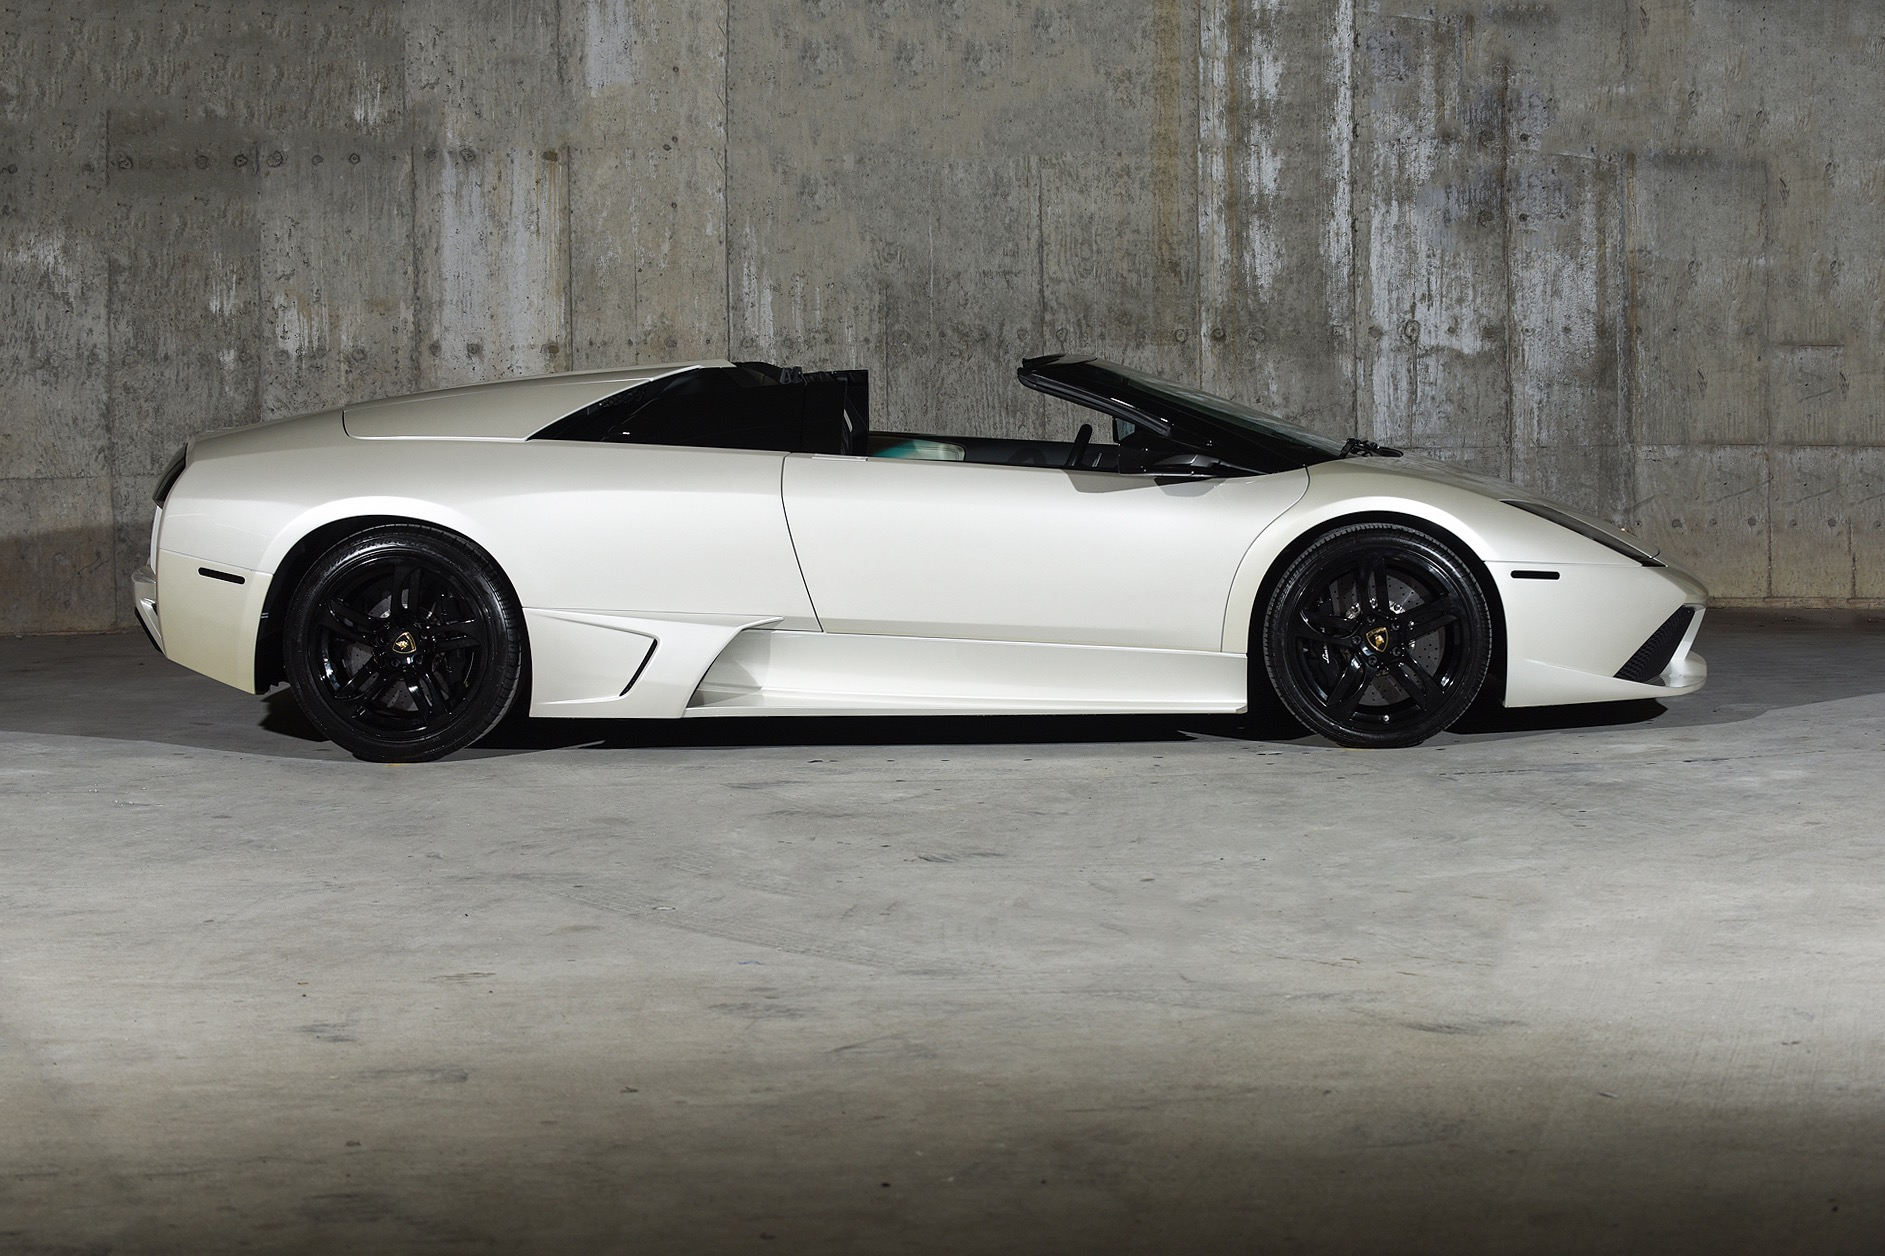 2010 Lamborghini Murcielago Lp 640 Stock 101c For Sale Near Valley